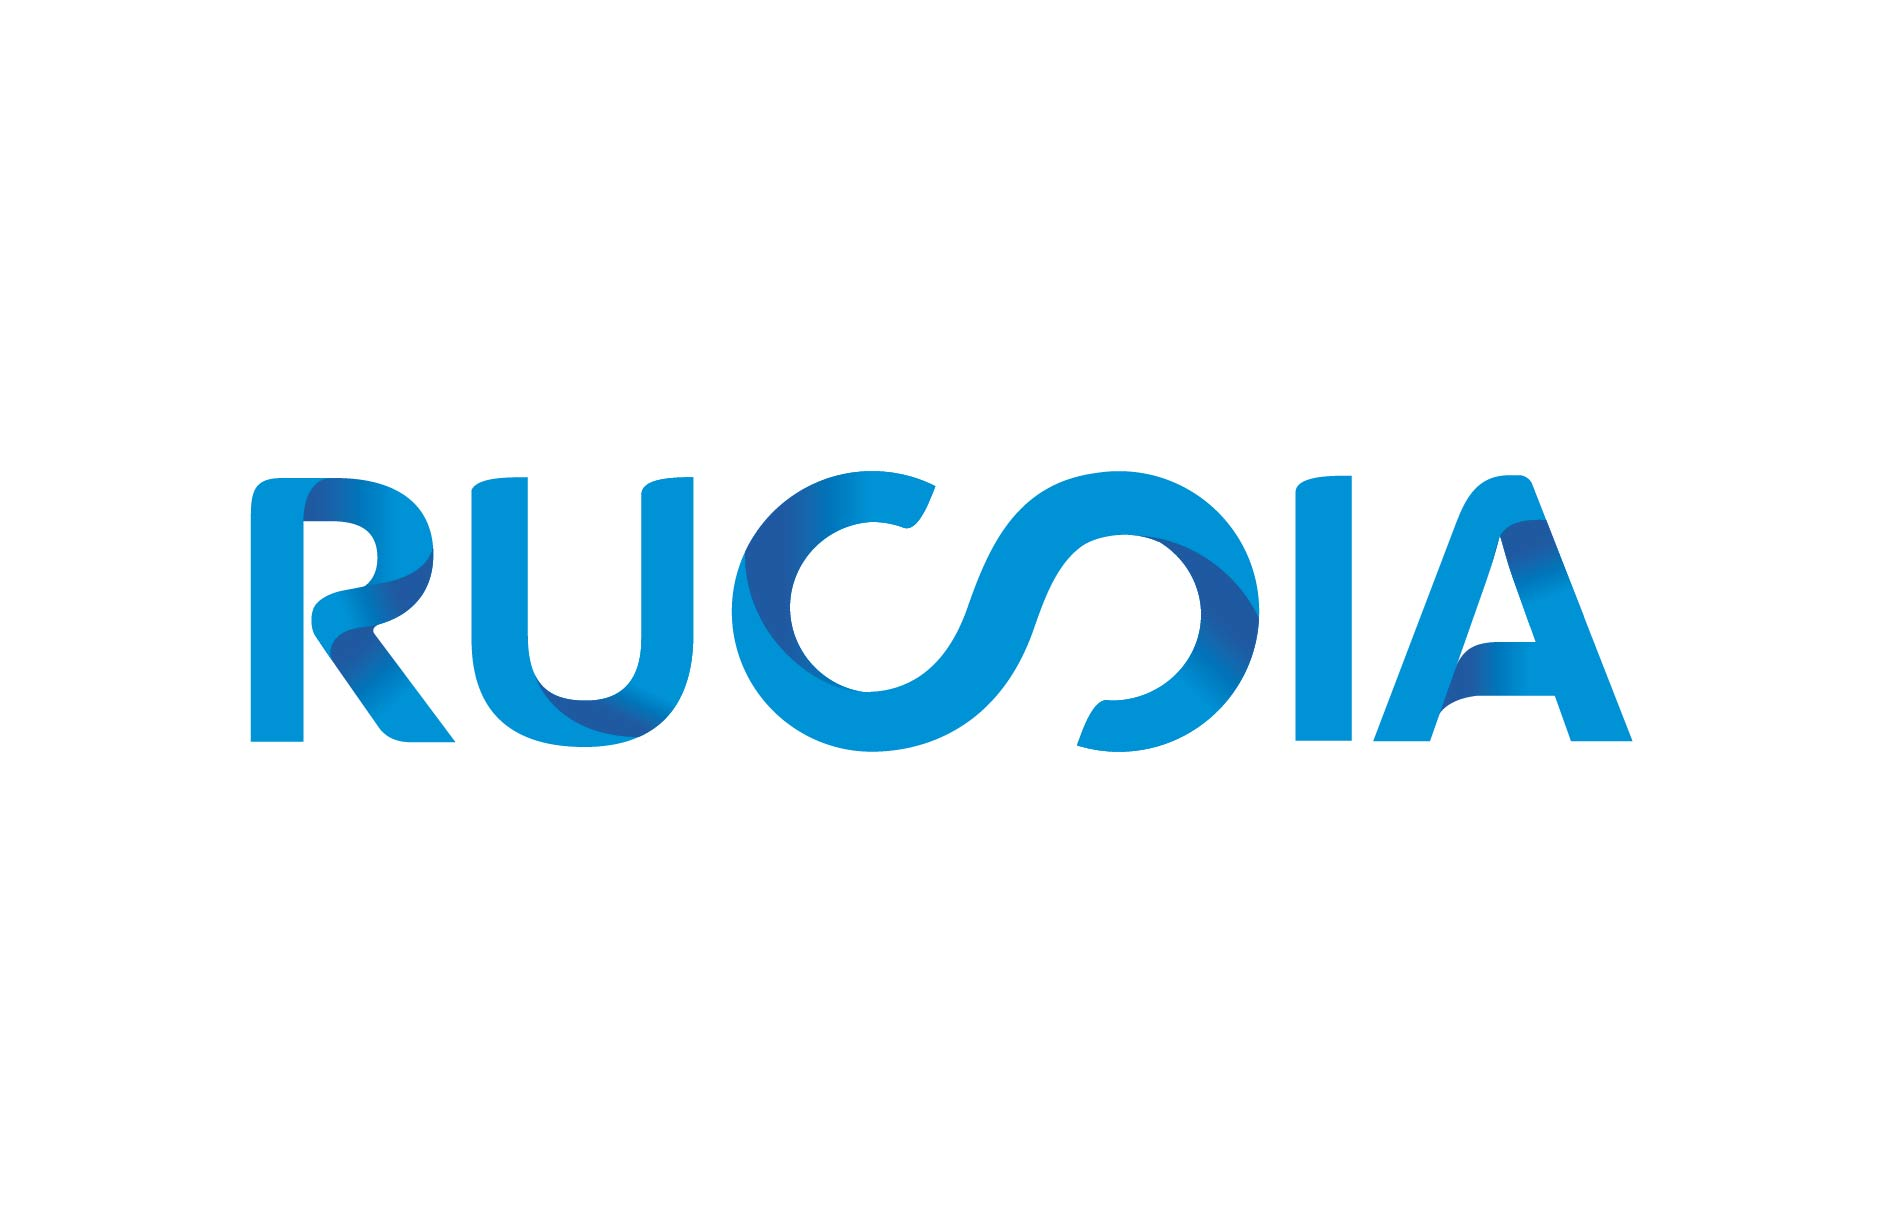 Туристический бренд Россия